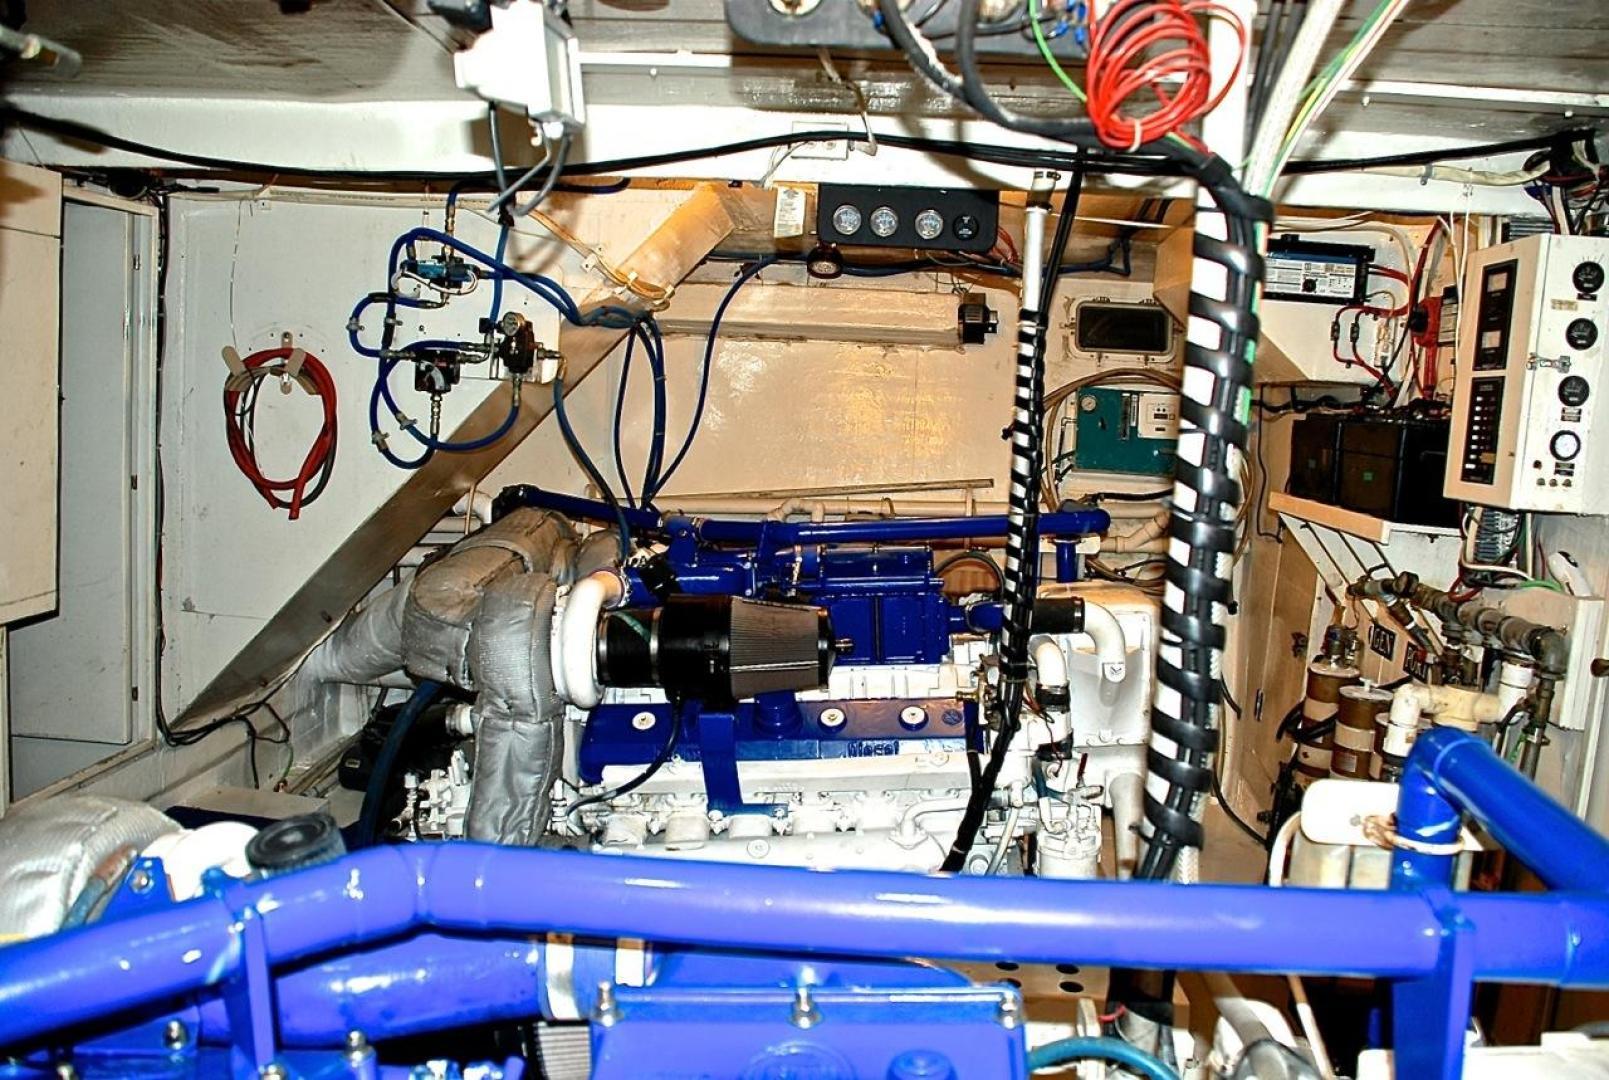 Infinity-Cockpit Motor Yacht 2001-Dont Matter Houston-Texas-United States-Engine Room-1005583 | Thumbnail